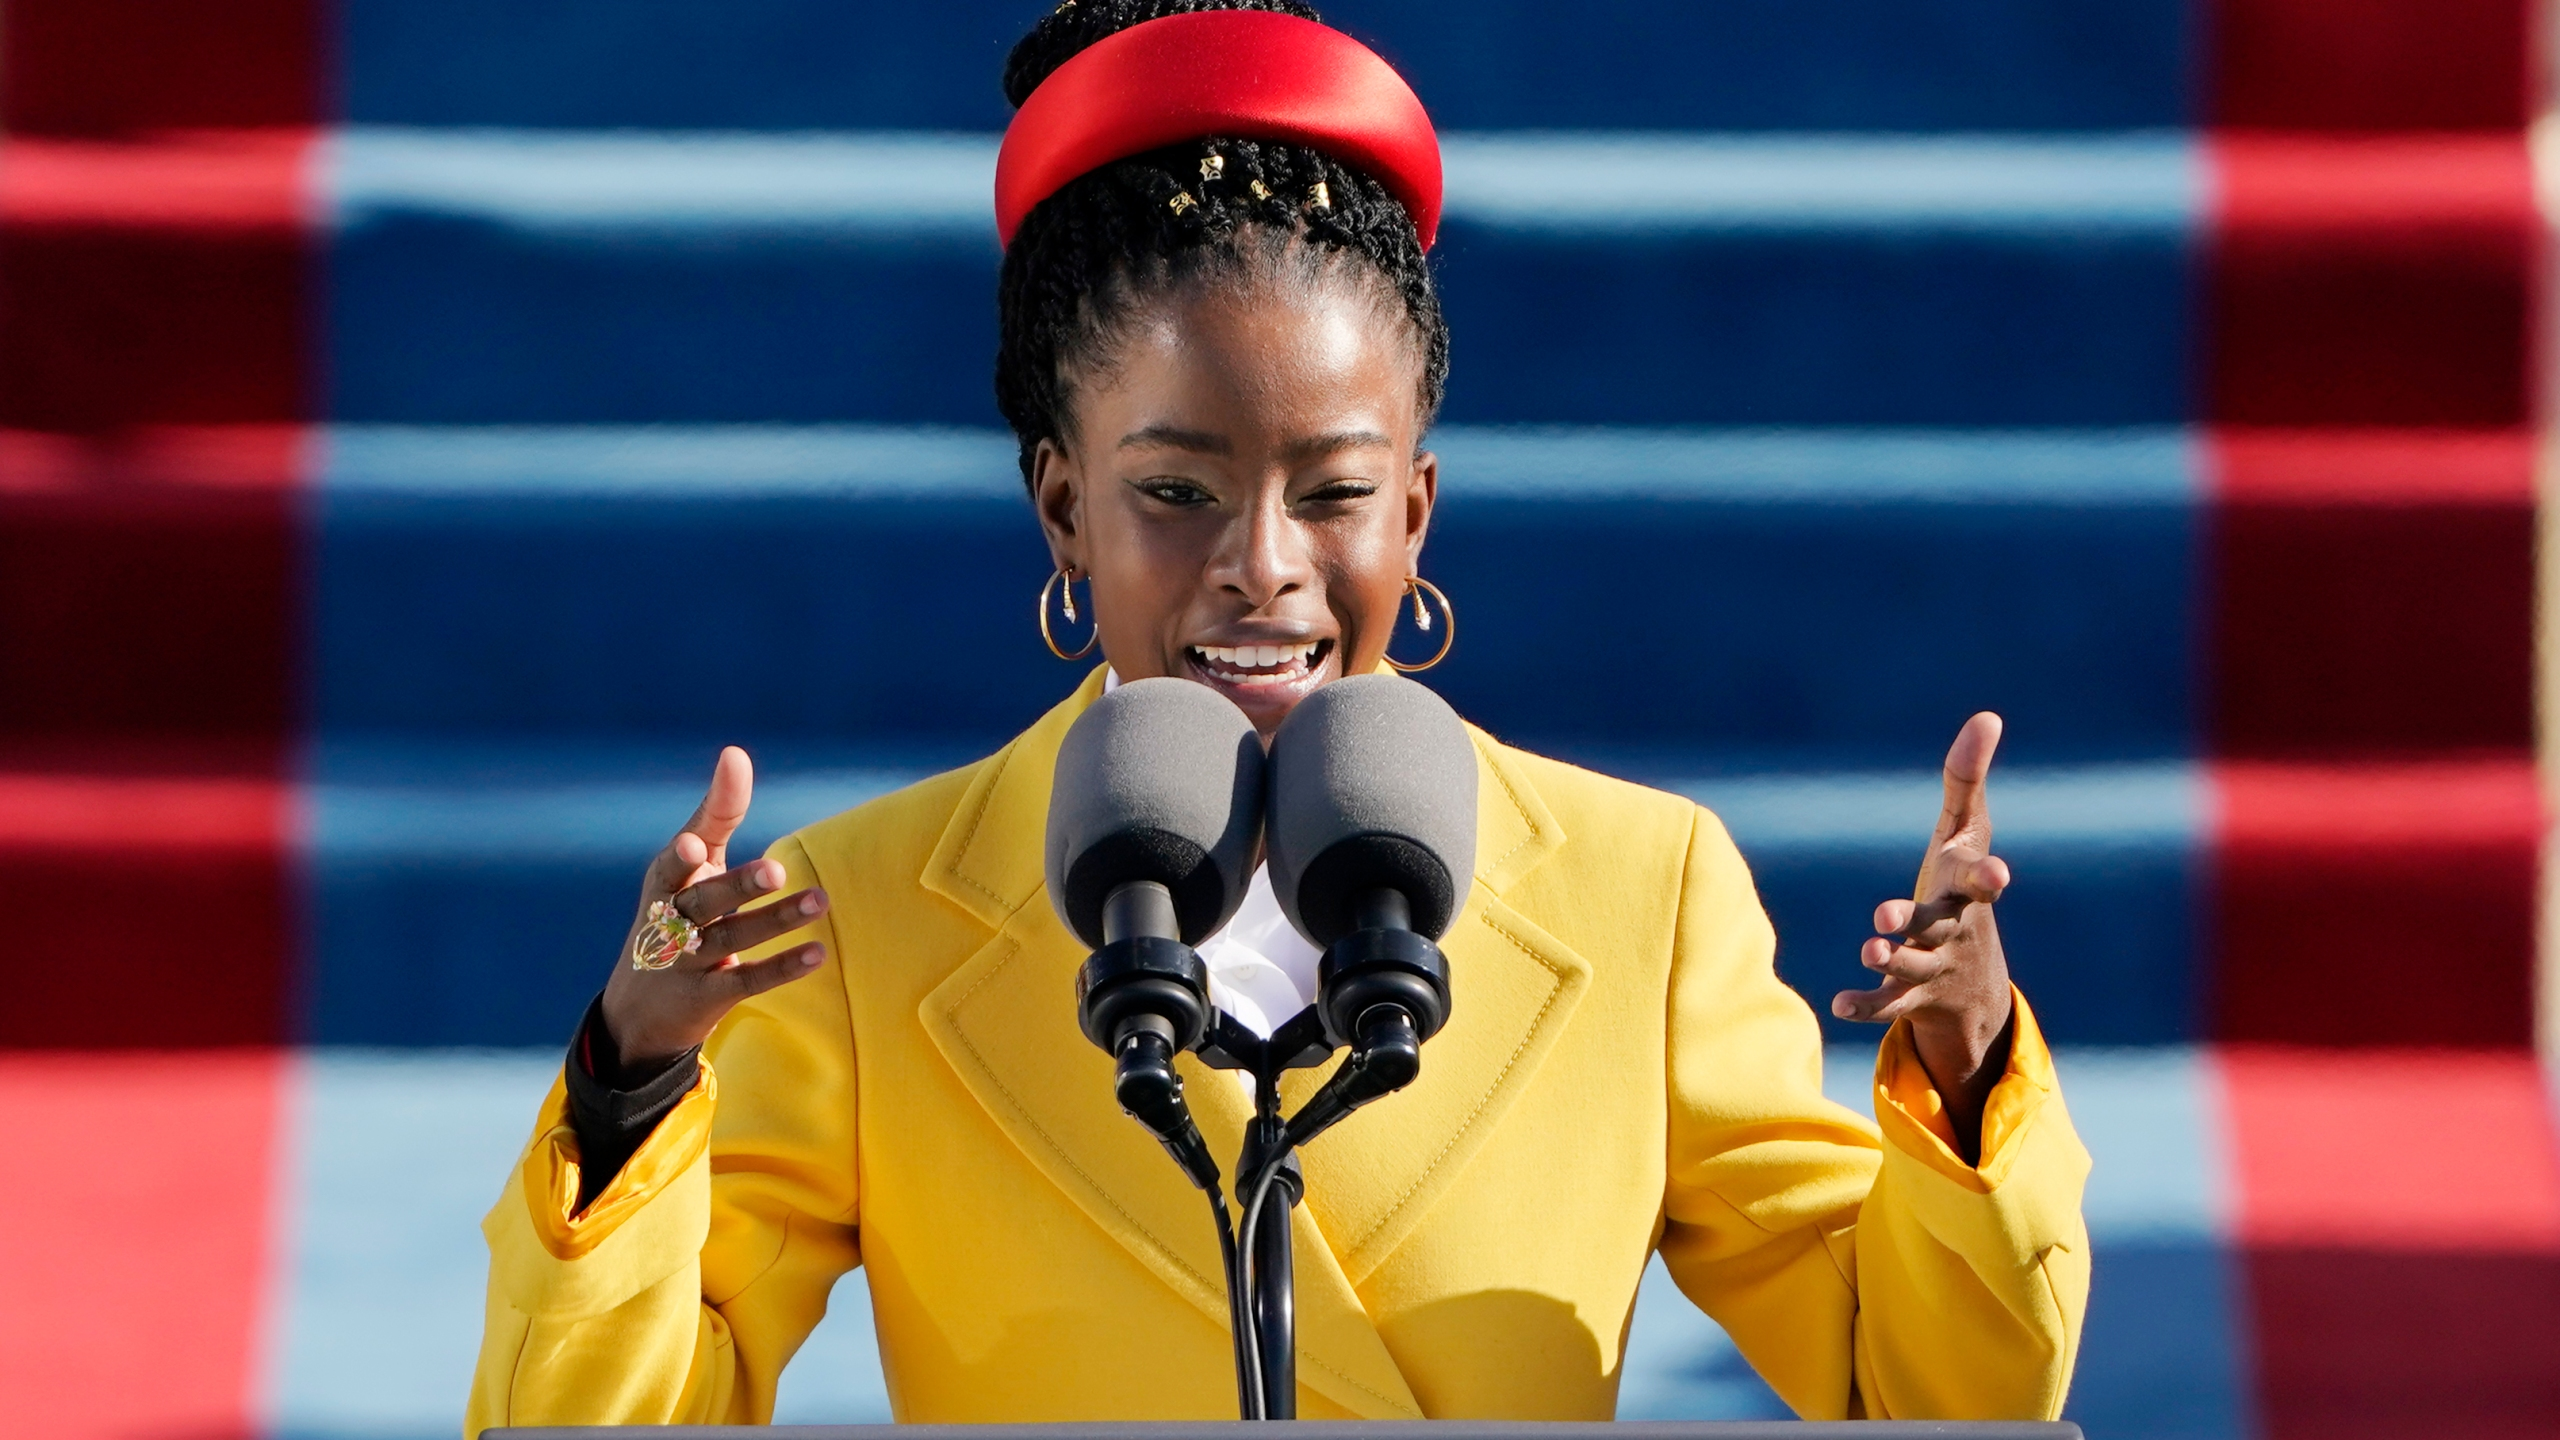 22-year-old Amanda Gorman, descendant of slaves, recites 'The Hill We  Climb' at inauguration | WAVY.com